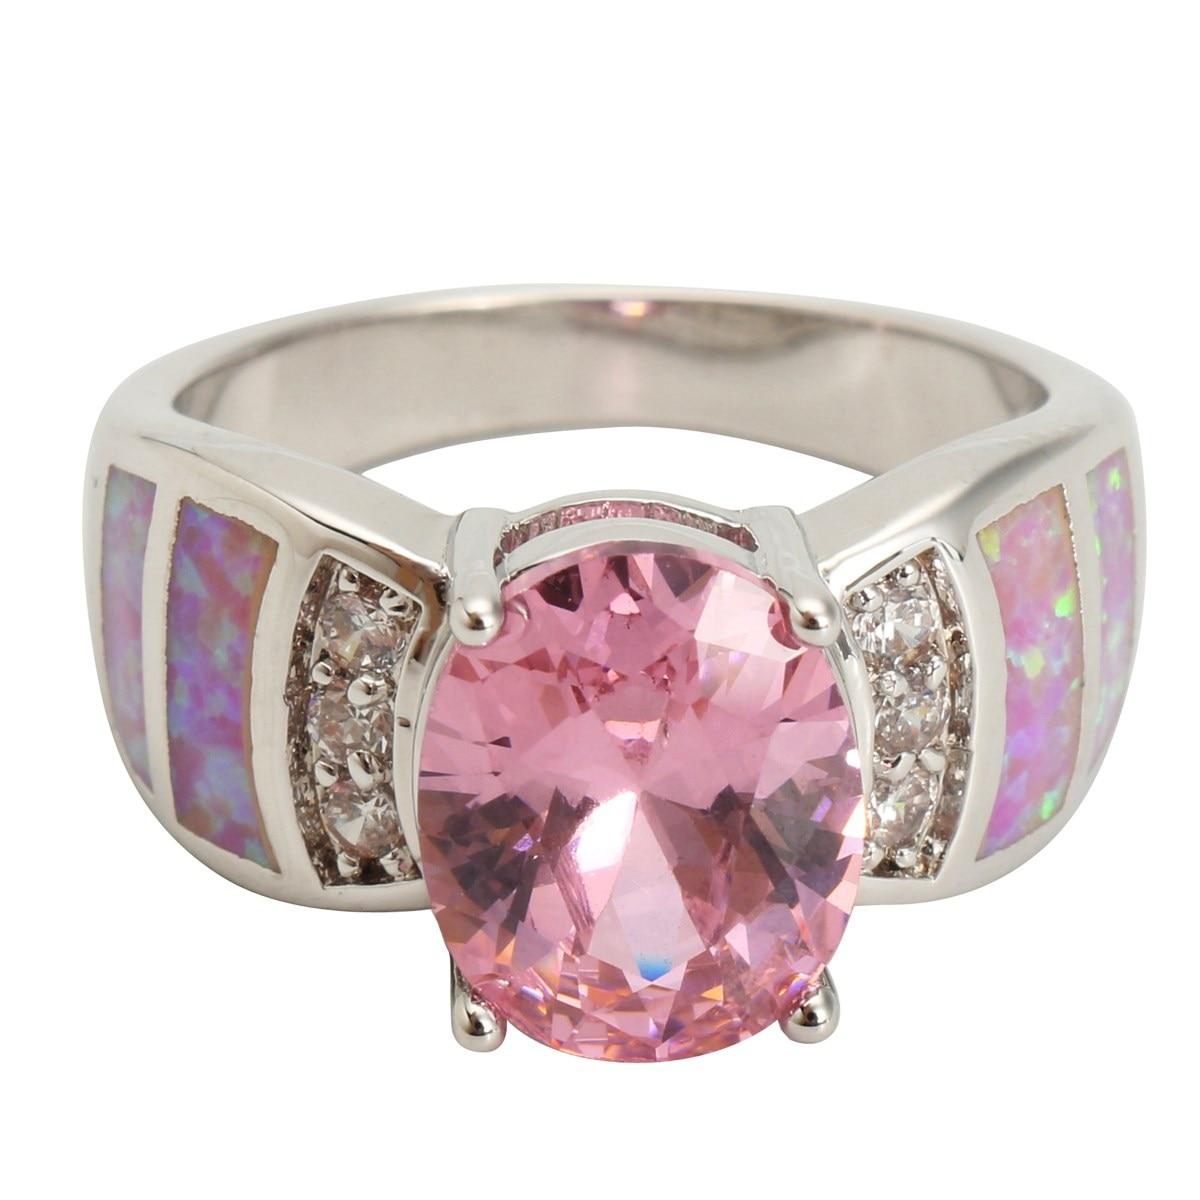 Size 6/7/8/9 Jewelry CZ Women Wedding Pink Blue Gem Opal Rings For ...